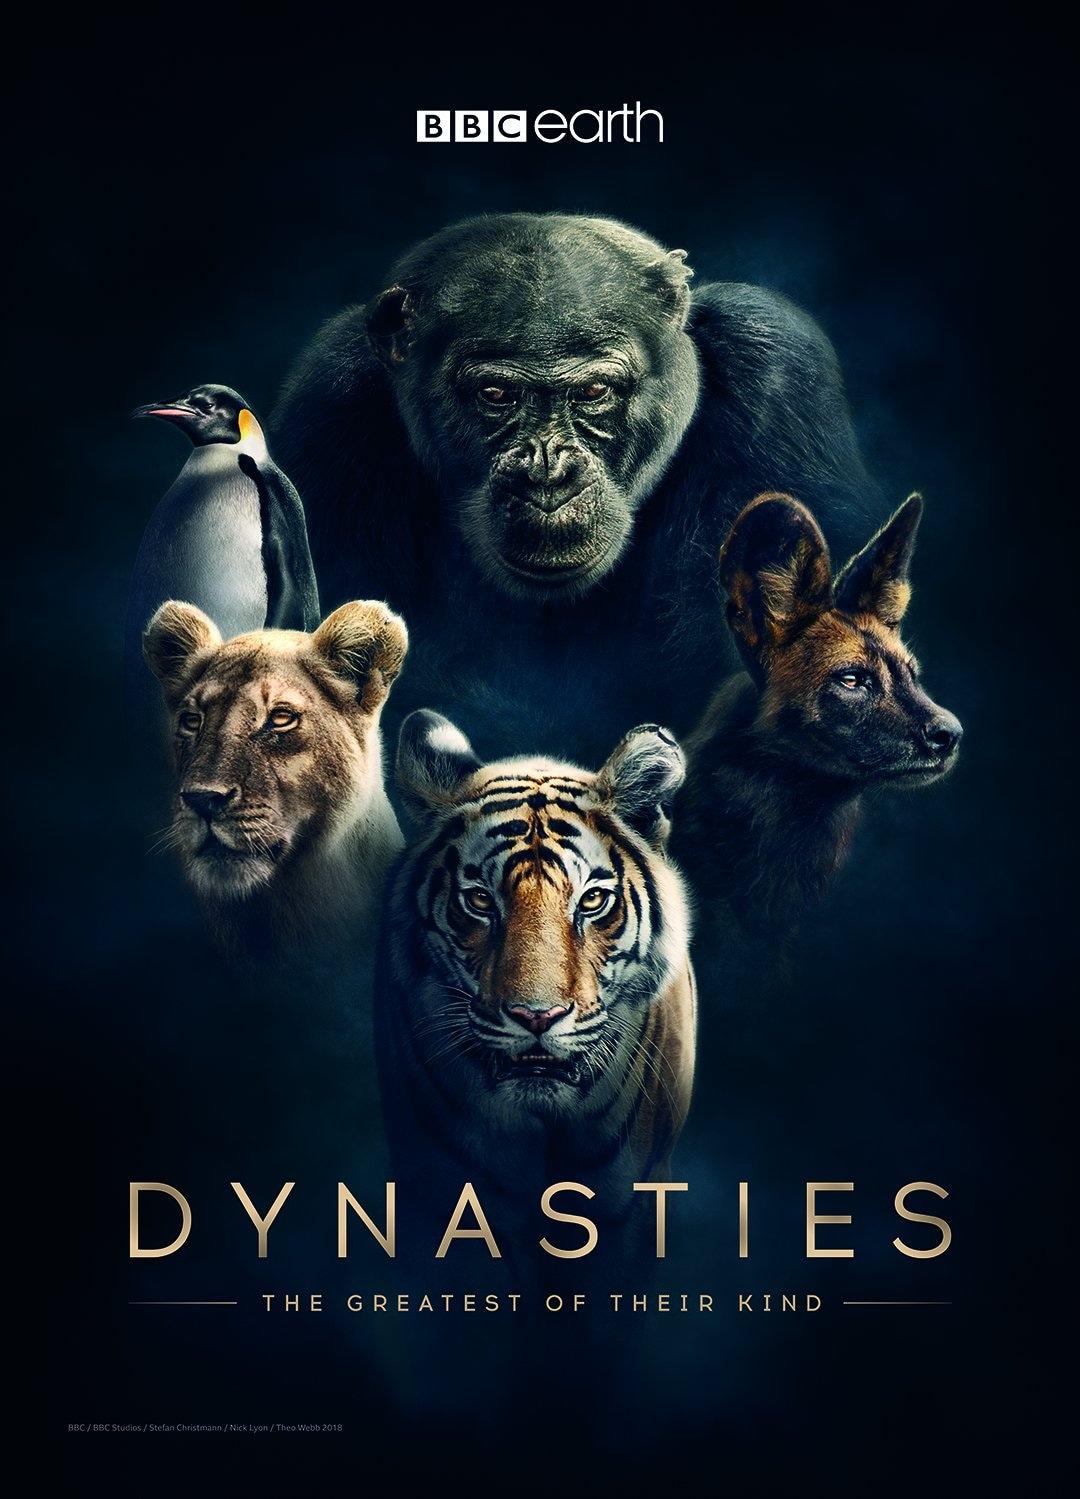 bbc dynasties poster BBC Dynasties poster